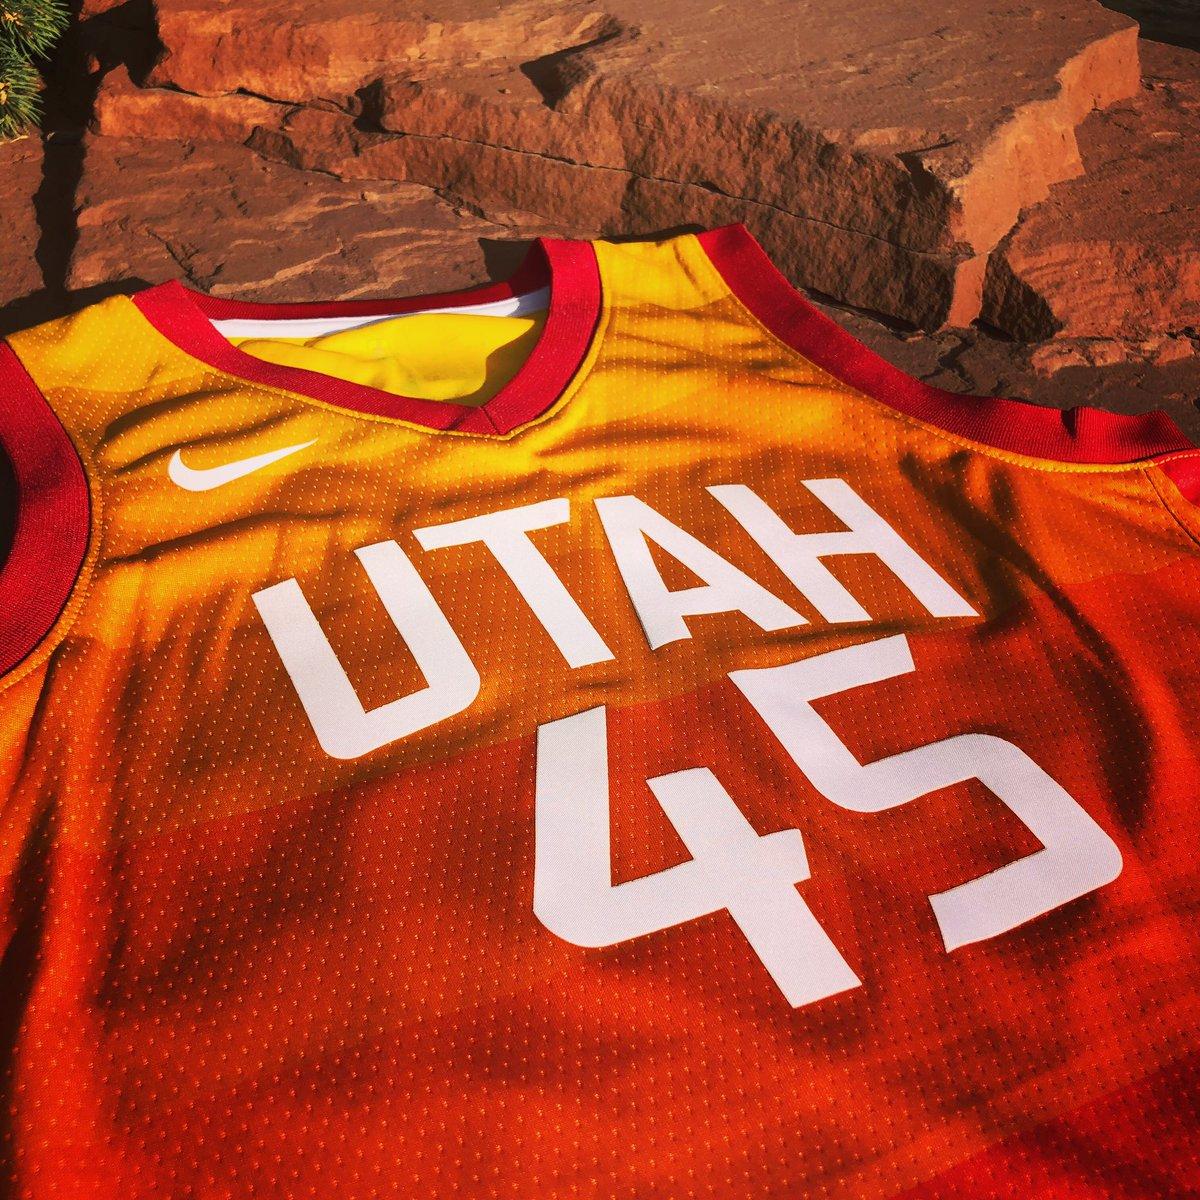 d46404ab4818 Utah Jazz Team Store on Twitter